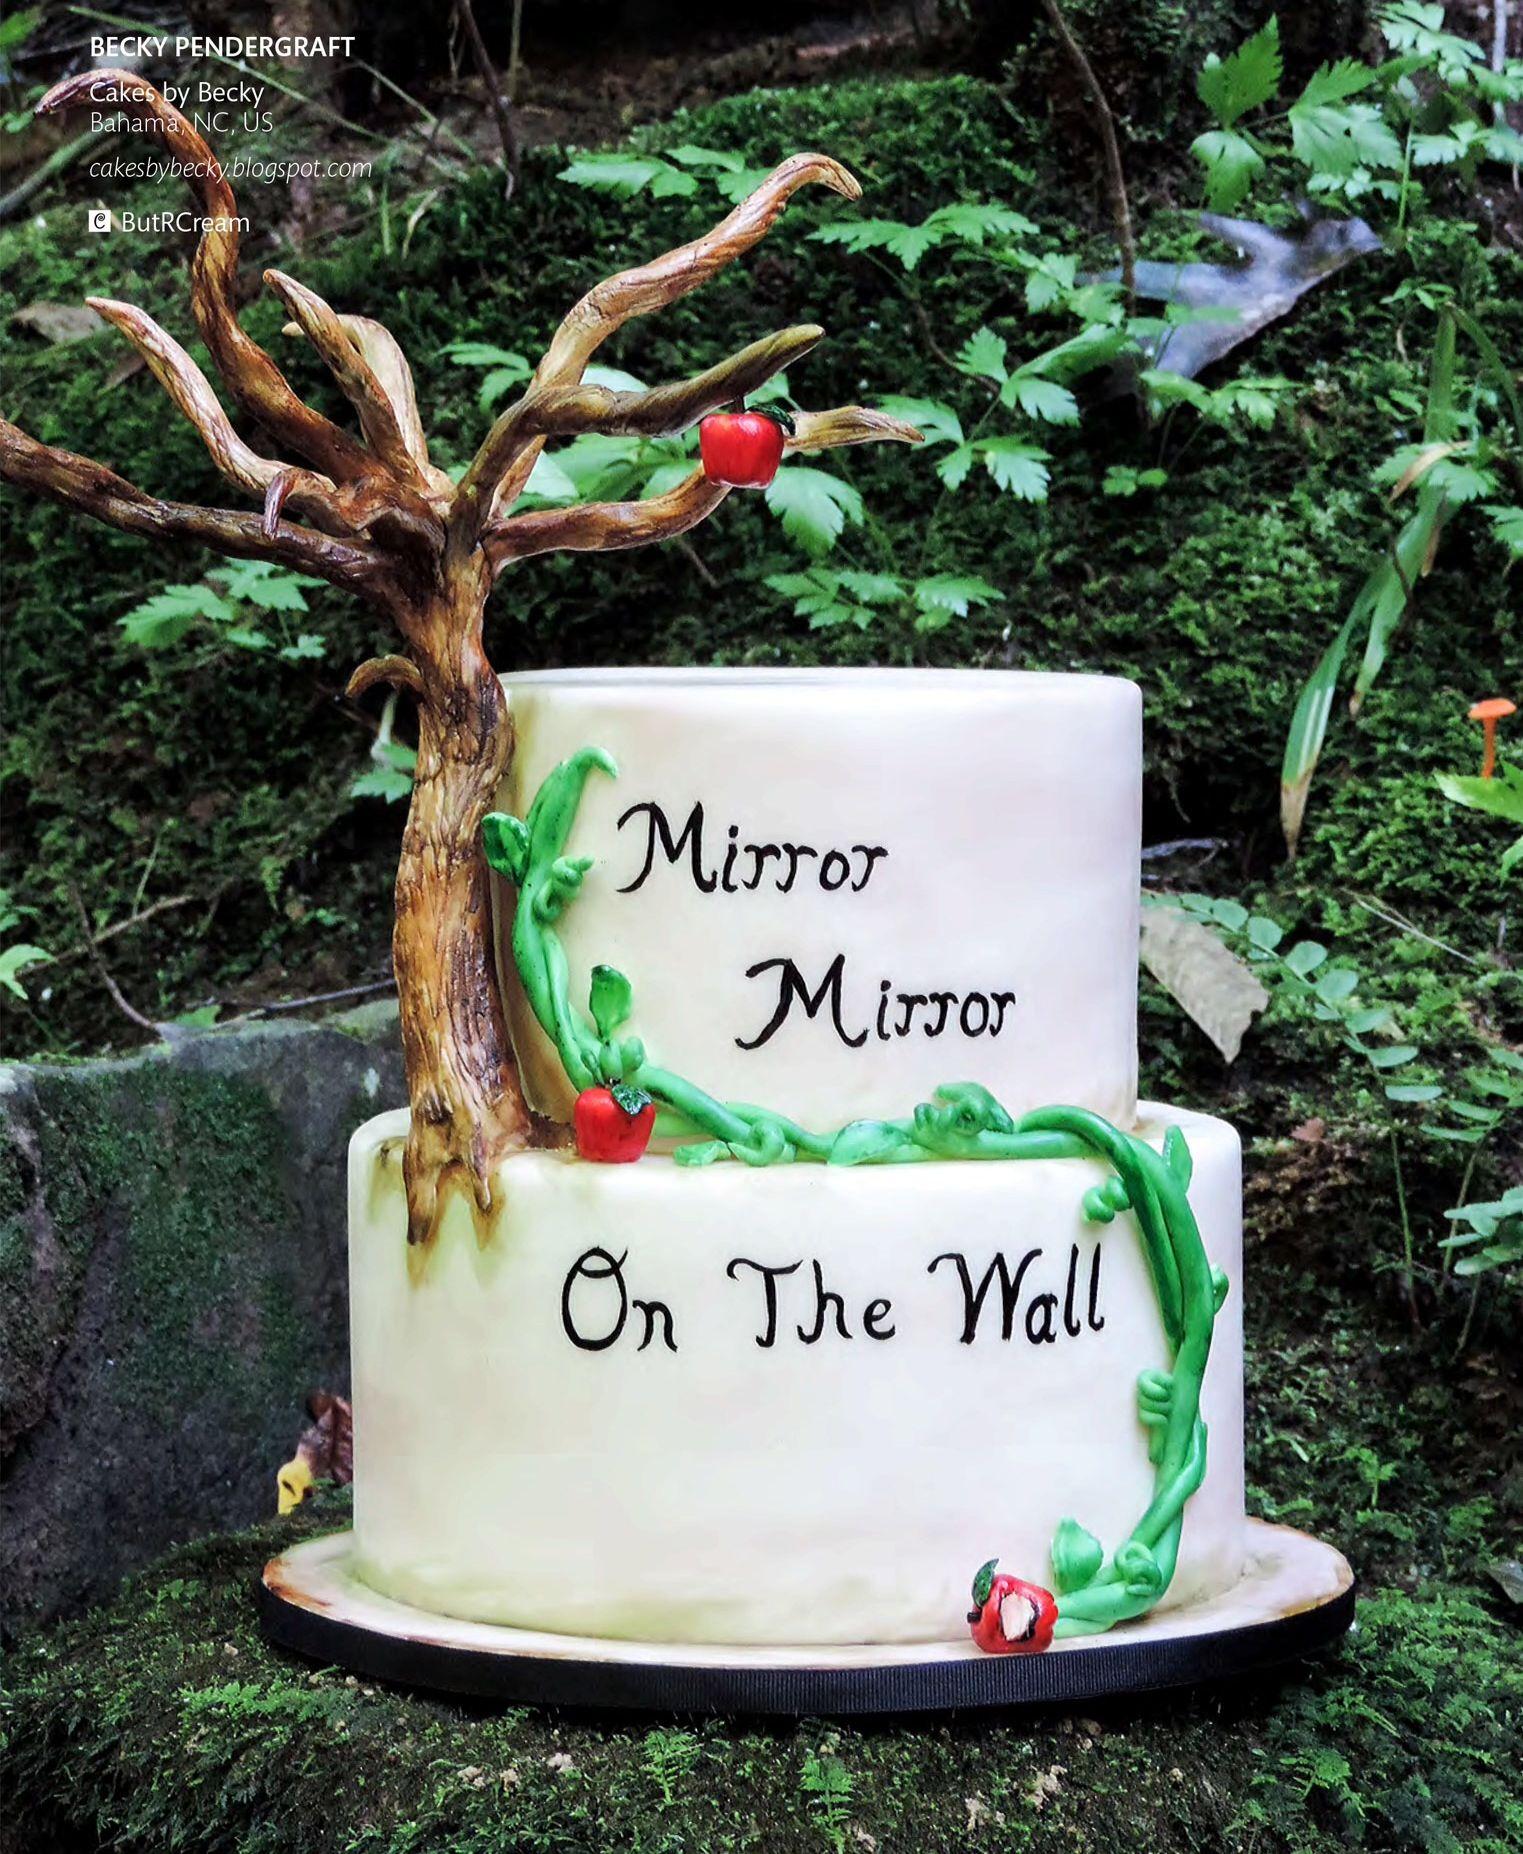 Snow White Fairytale Cake   Cake Central Magazine   Volume 4 Issue 10 - October 2013